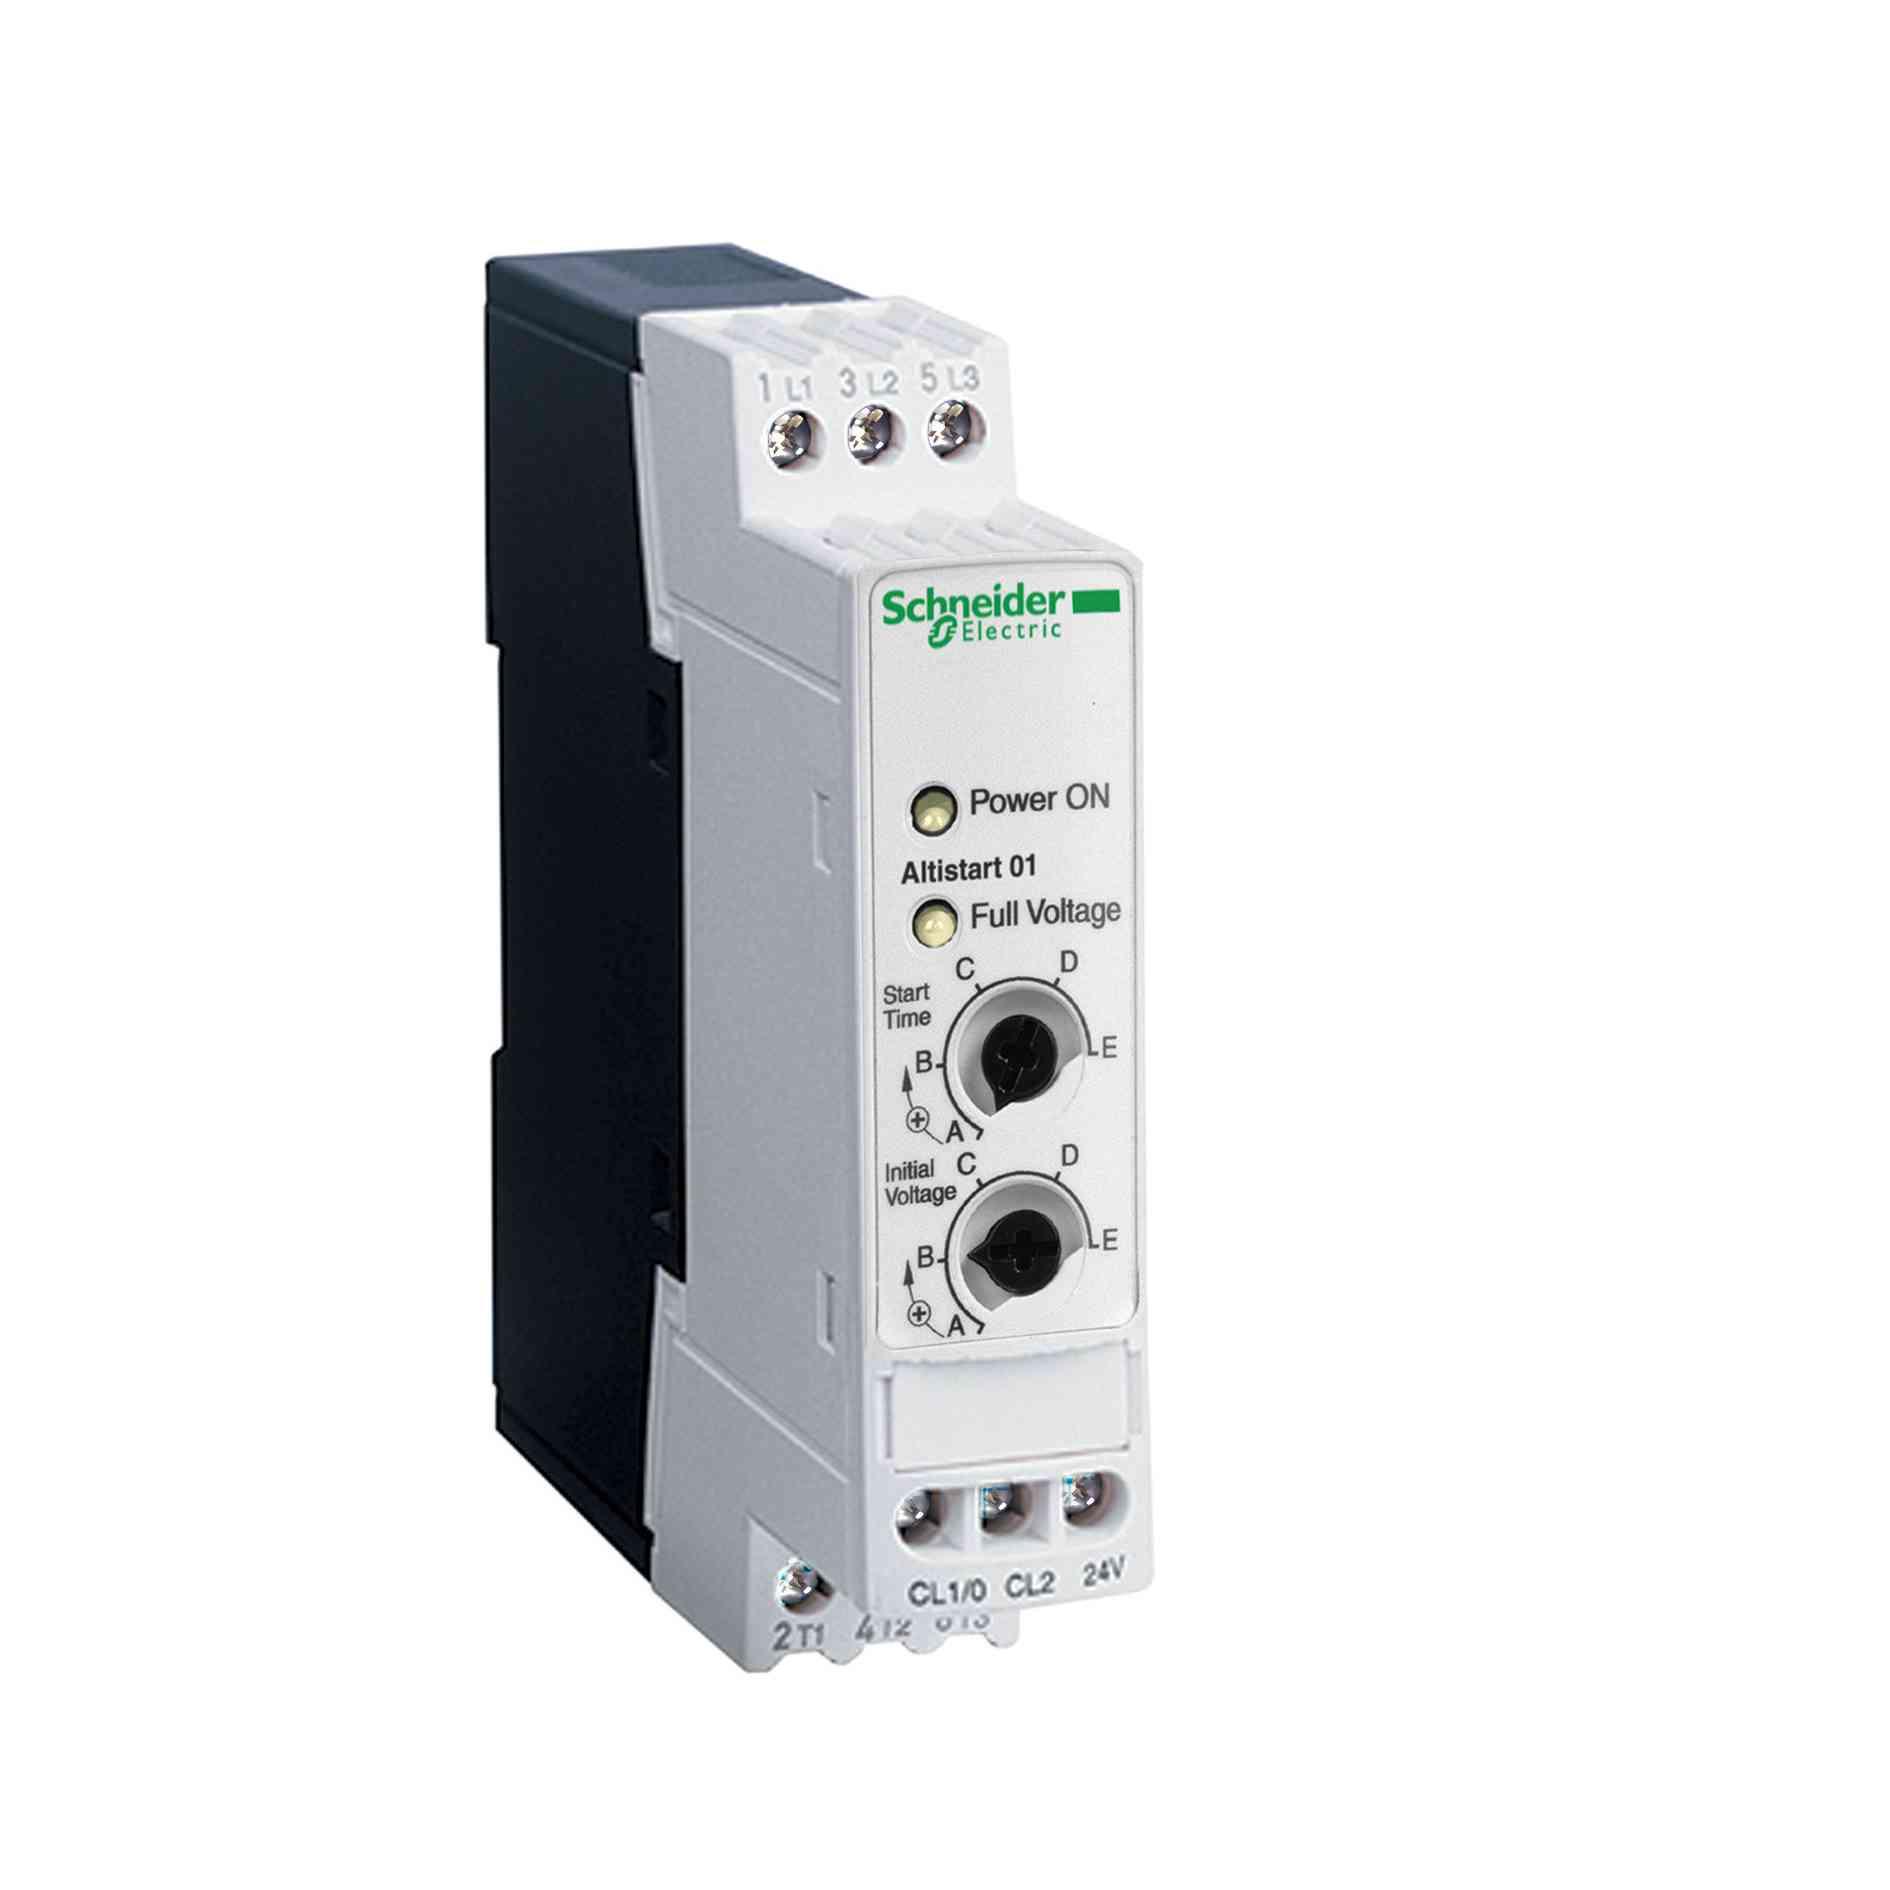 Mehki zaganjalnik za asinhroni motor - ATS01 - 6 A - 110 do 480 V - 0,75 do 3 KW